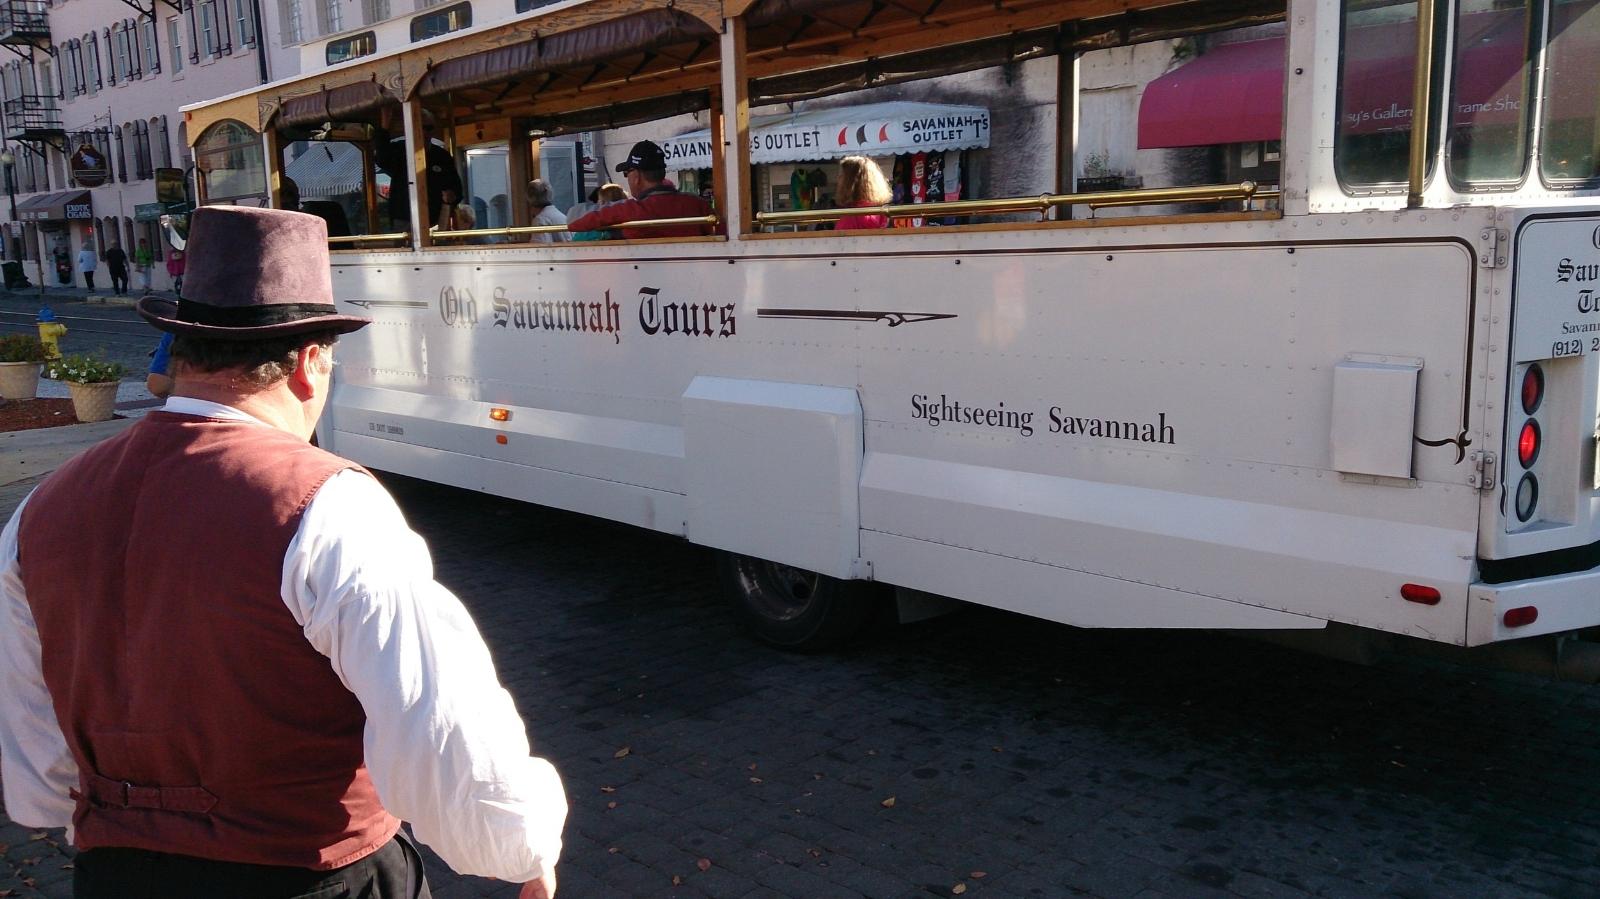 historic Savannah tour trolley